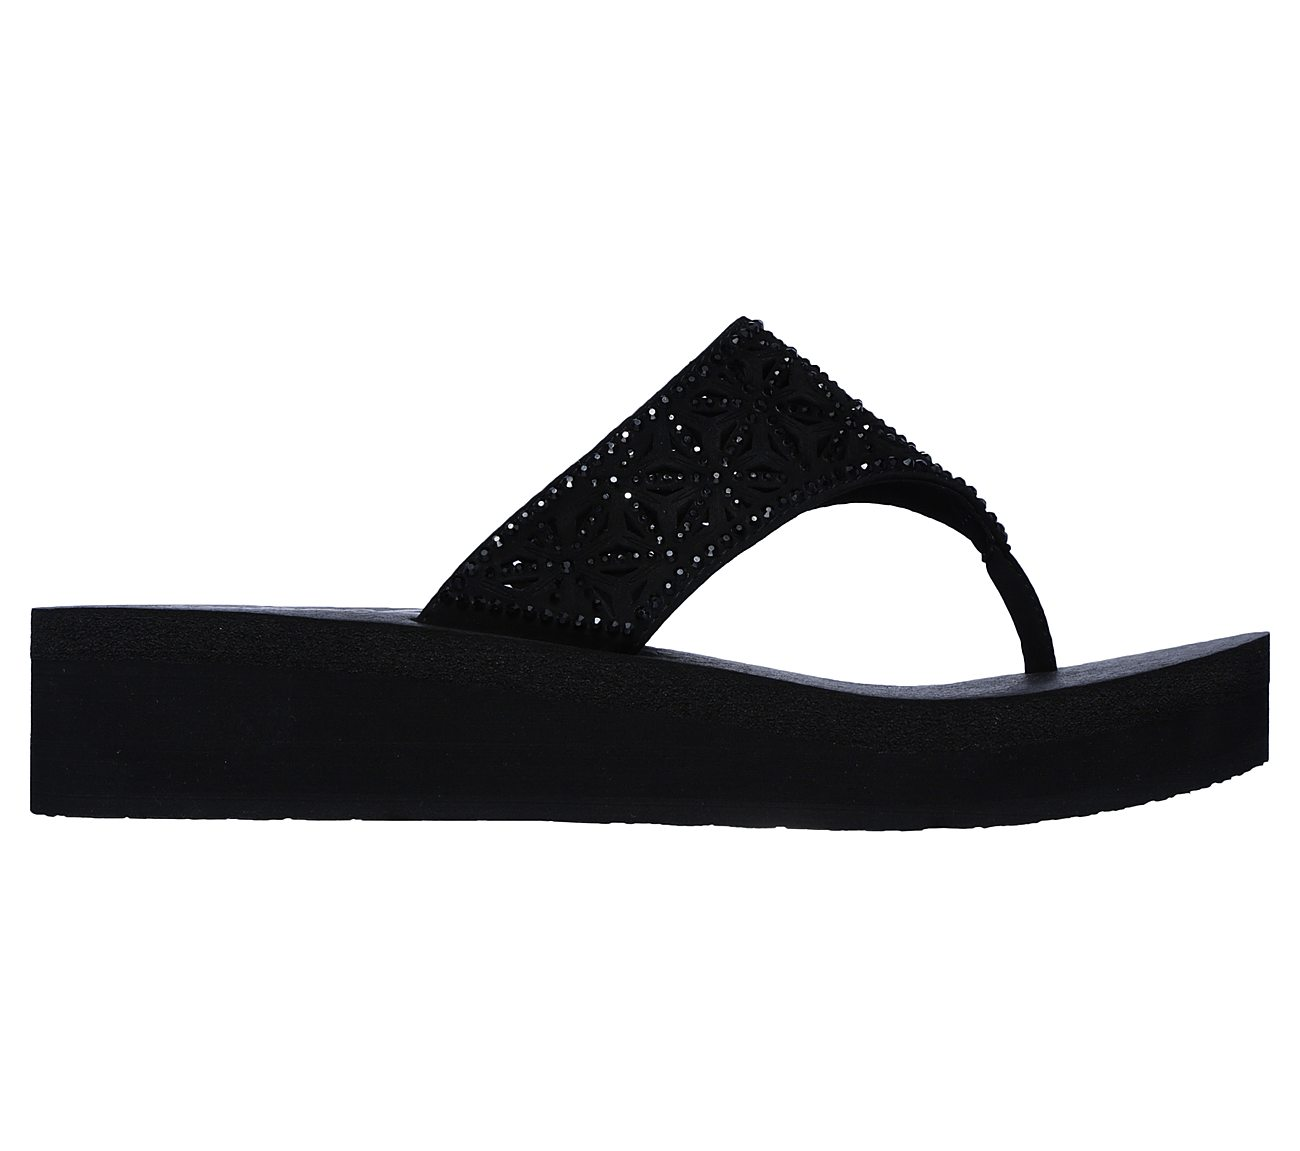 0cd584ca0cce Buy SKECHERS Vinyasa - Glass Star SKECHERS Cali Shoes only £32.00